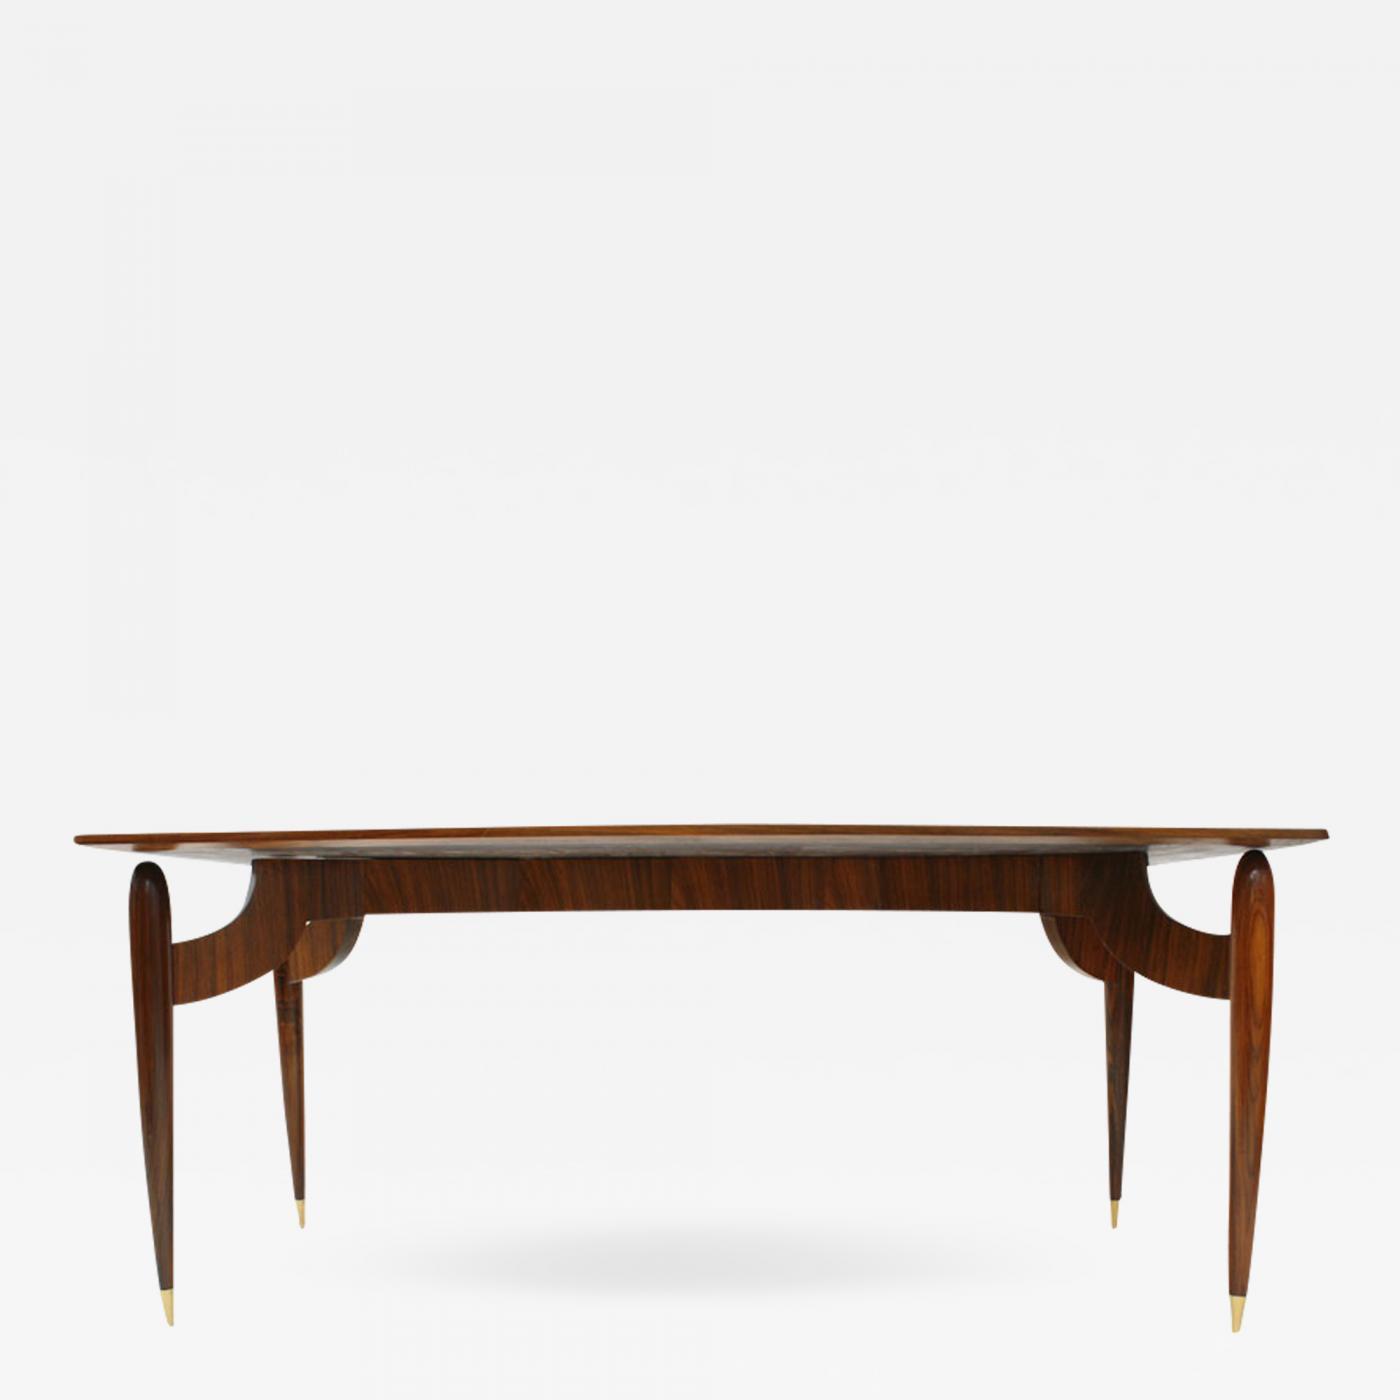 Magnificent Carlo Mollino In The Style Of Carlo Mollino Mid Century Rosewood Dining Table Italy 1950S Inzonedesignstudio Interior Chair Design Inzonedesignstudiocom